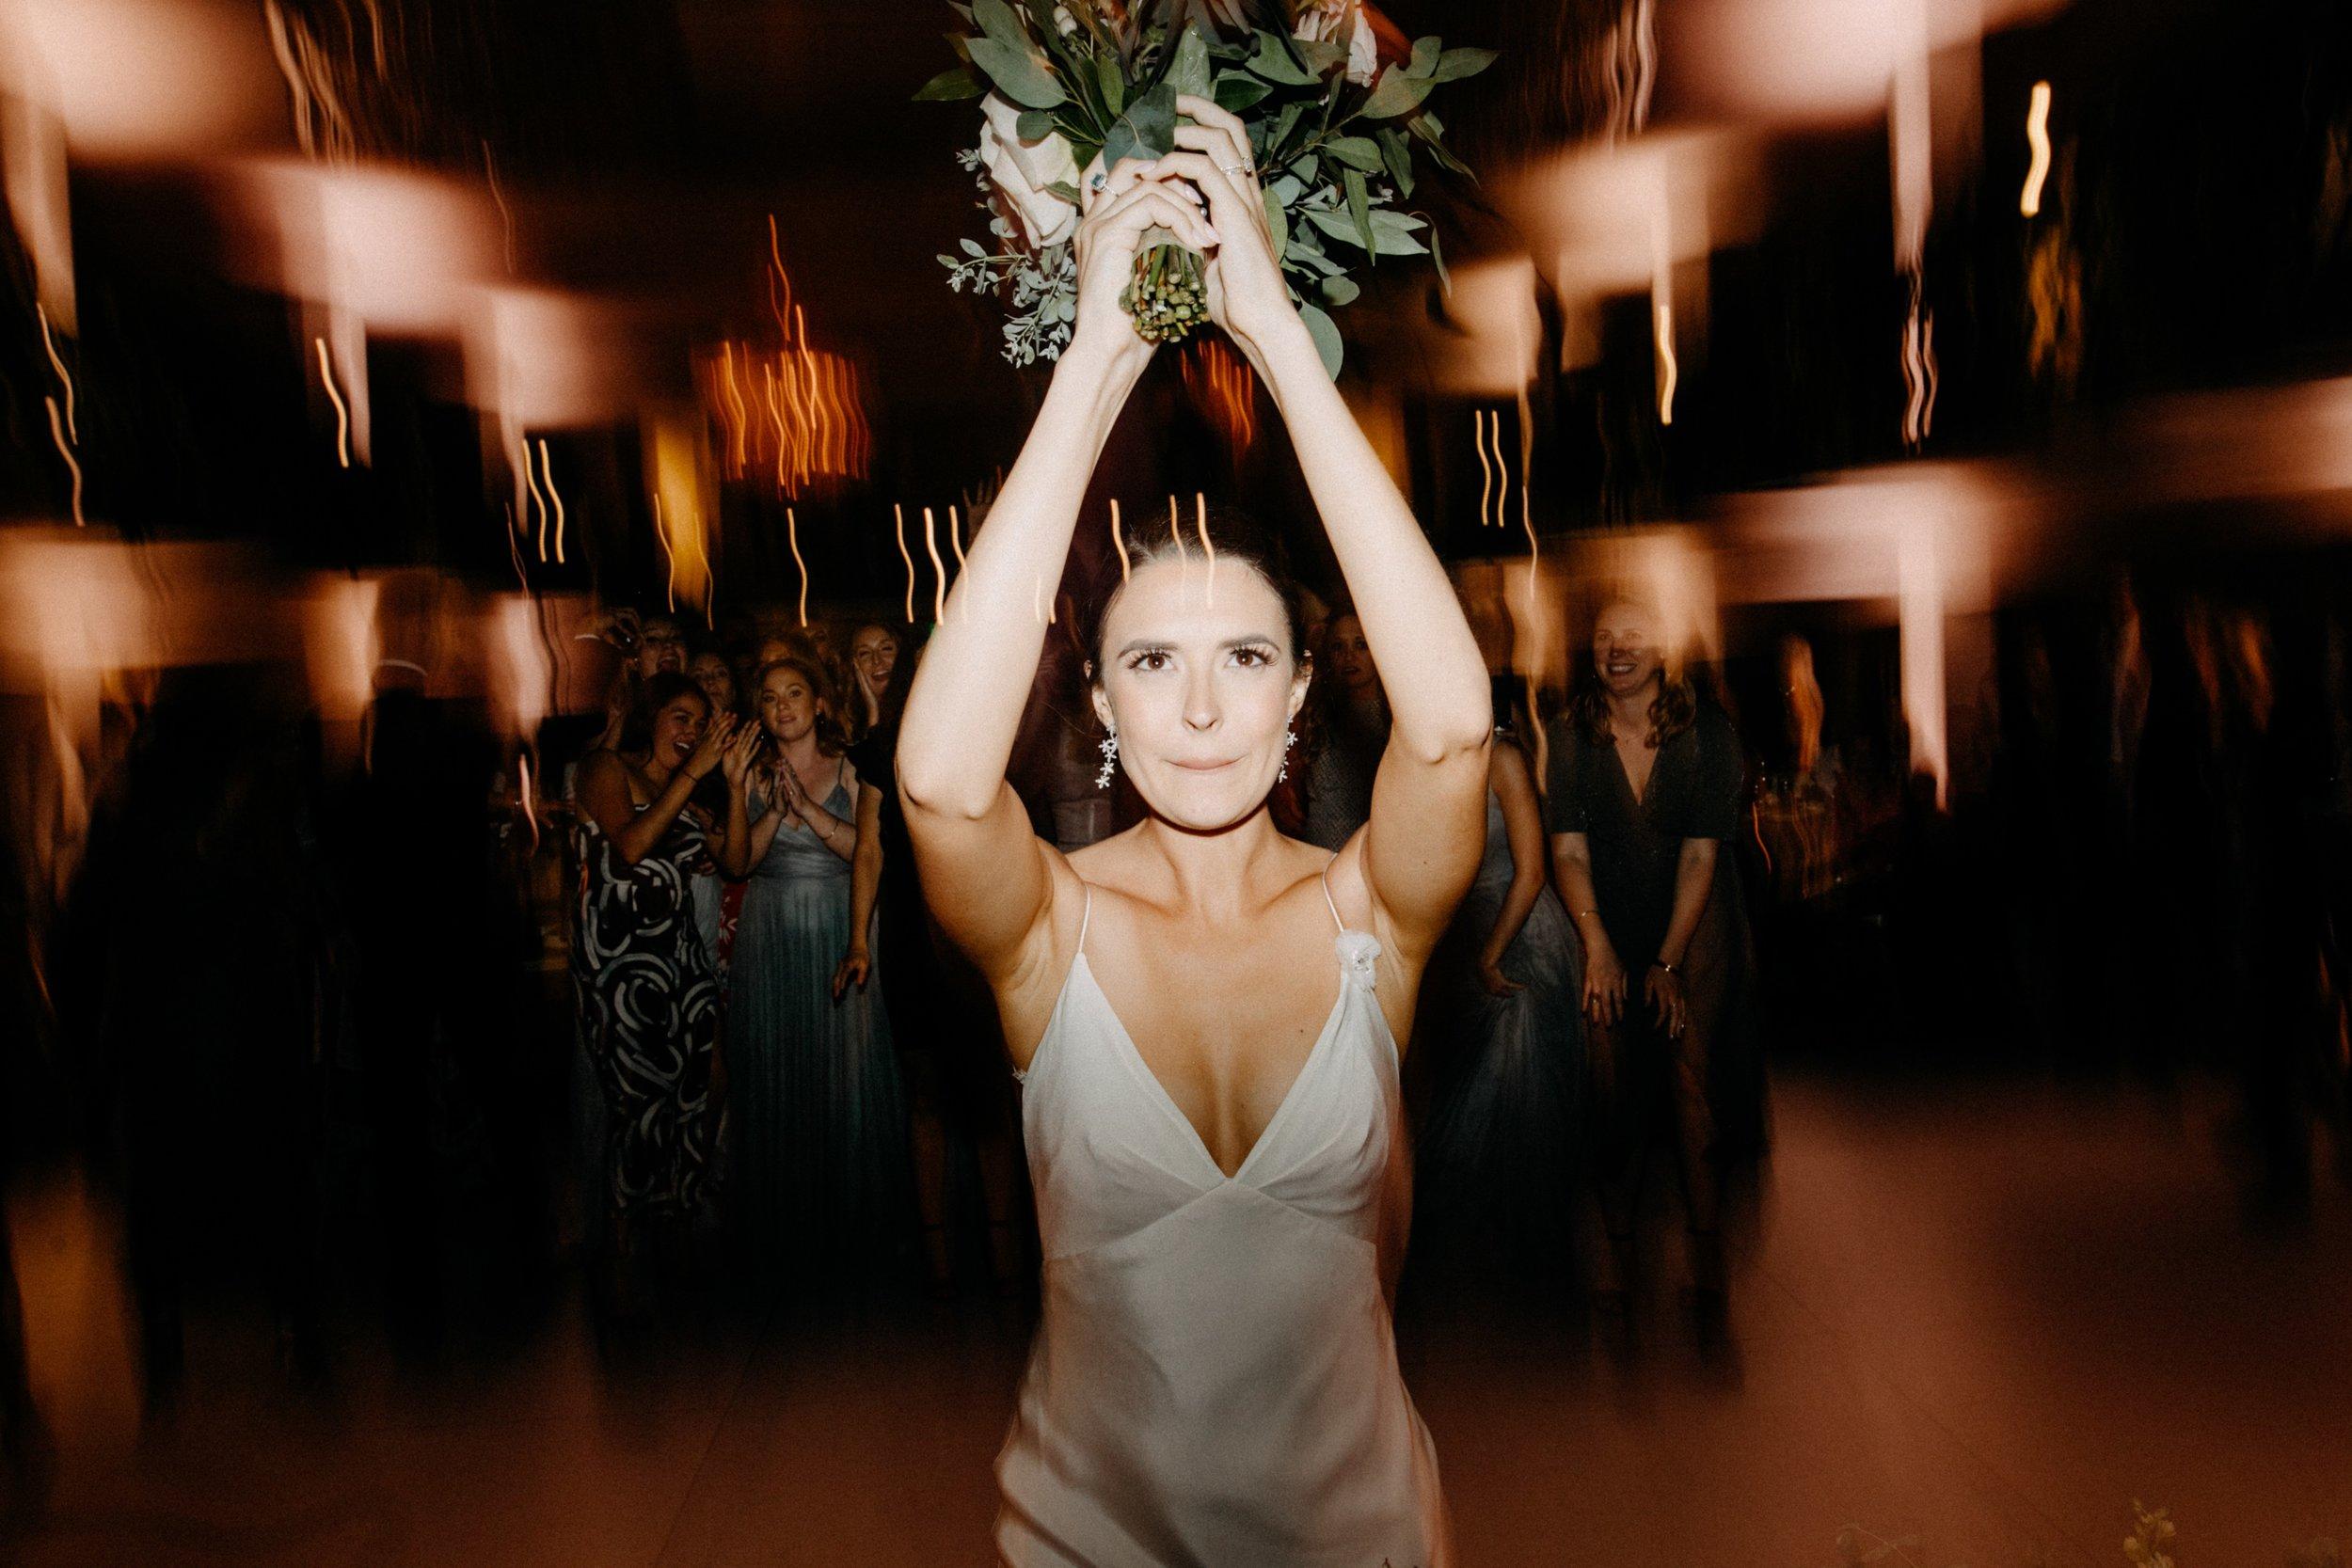 st-anthony-hotel-wedding-photography-10176san-antonio.JPG